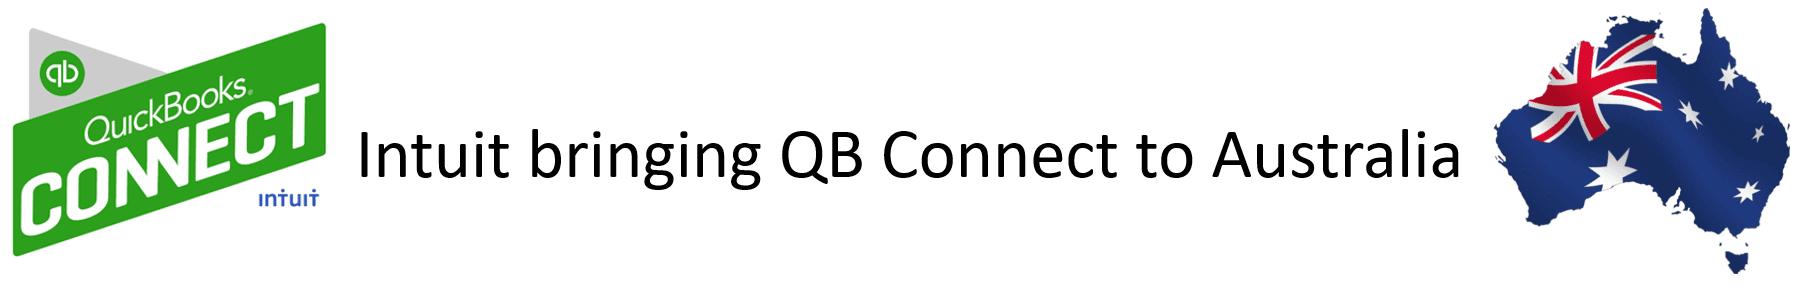 qbconnect